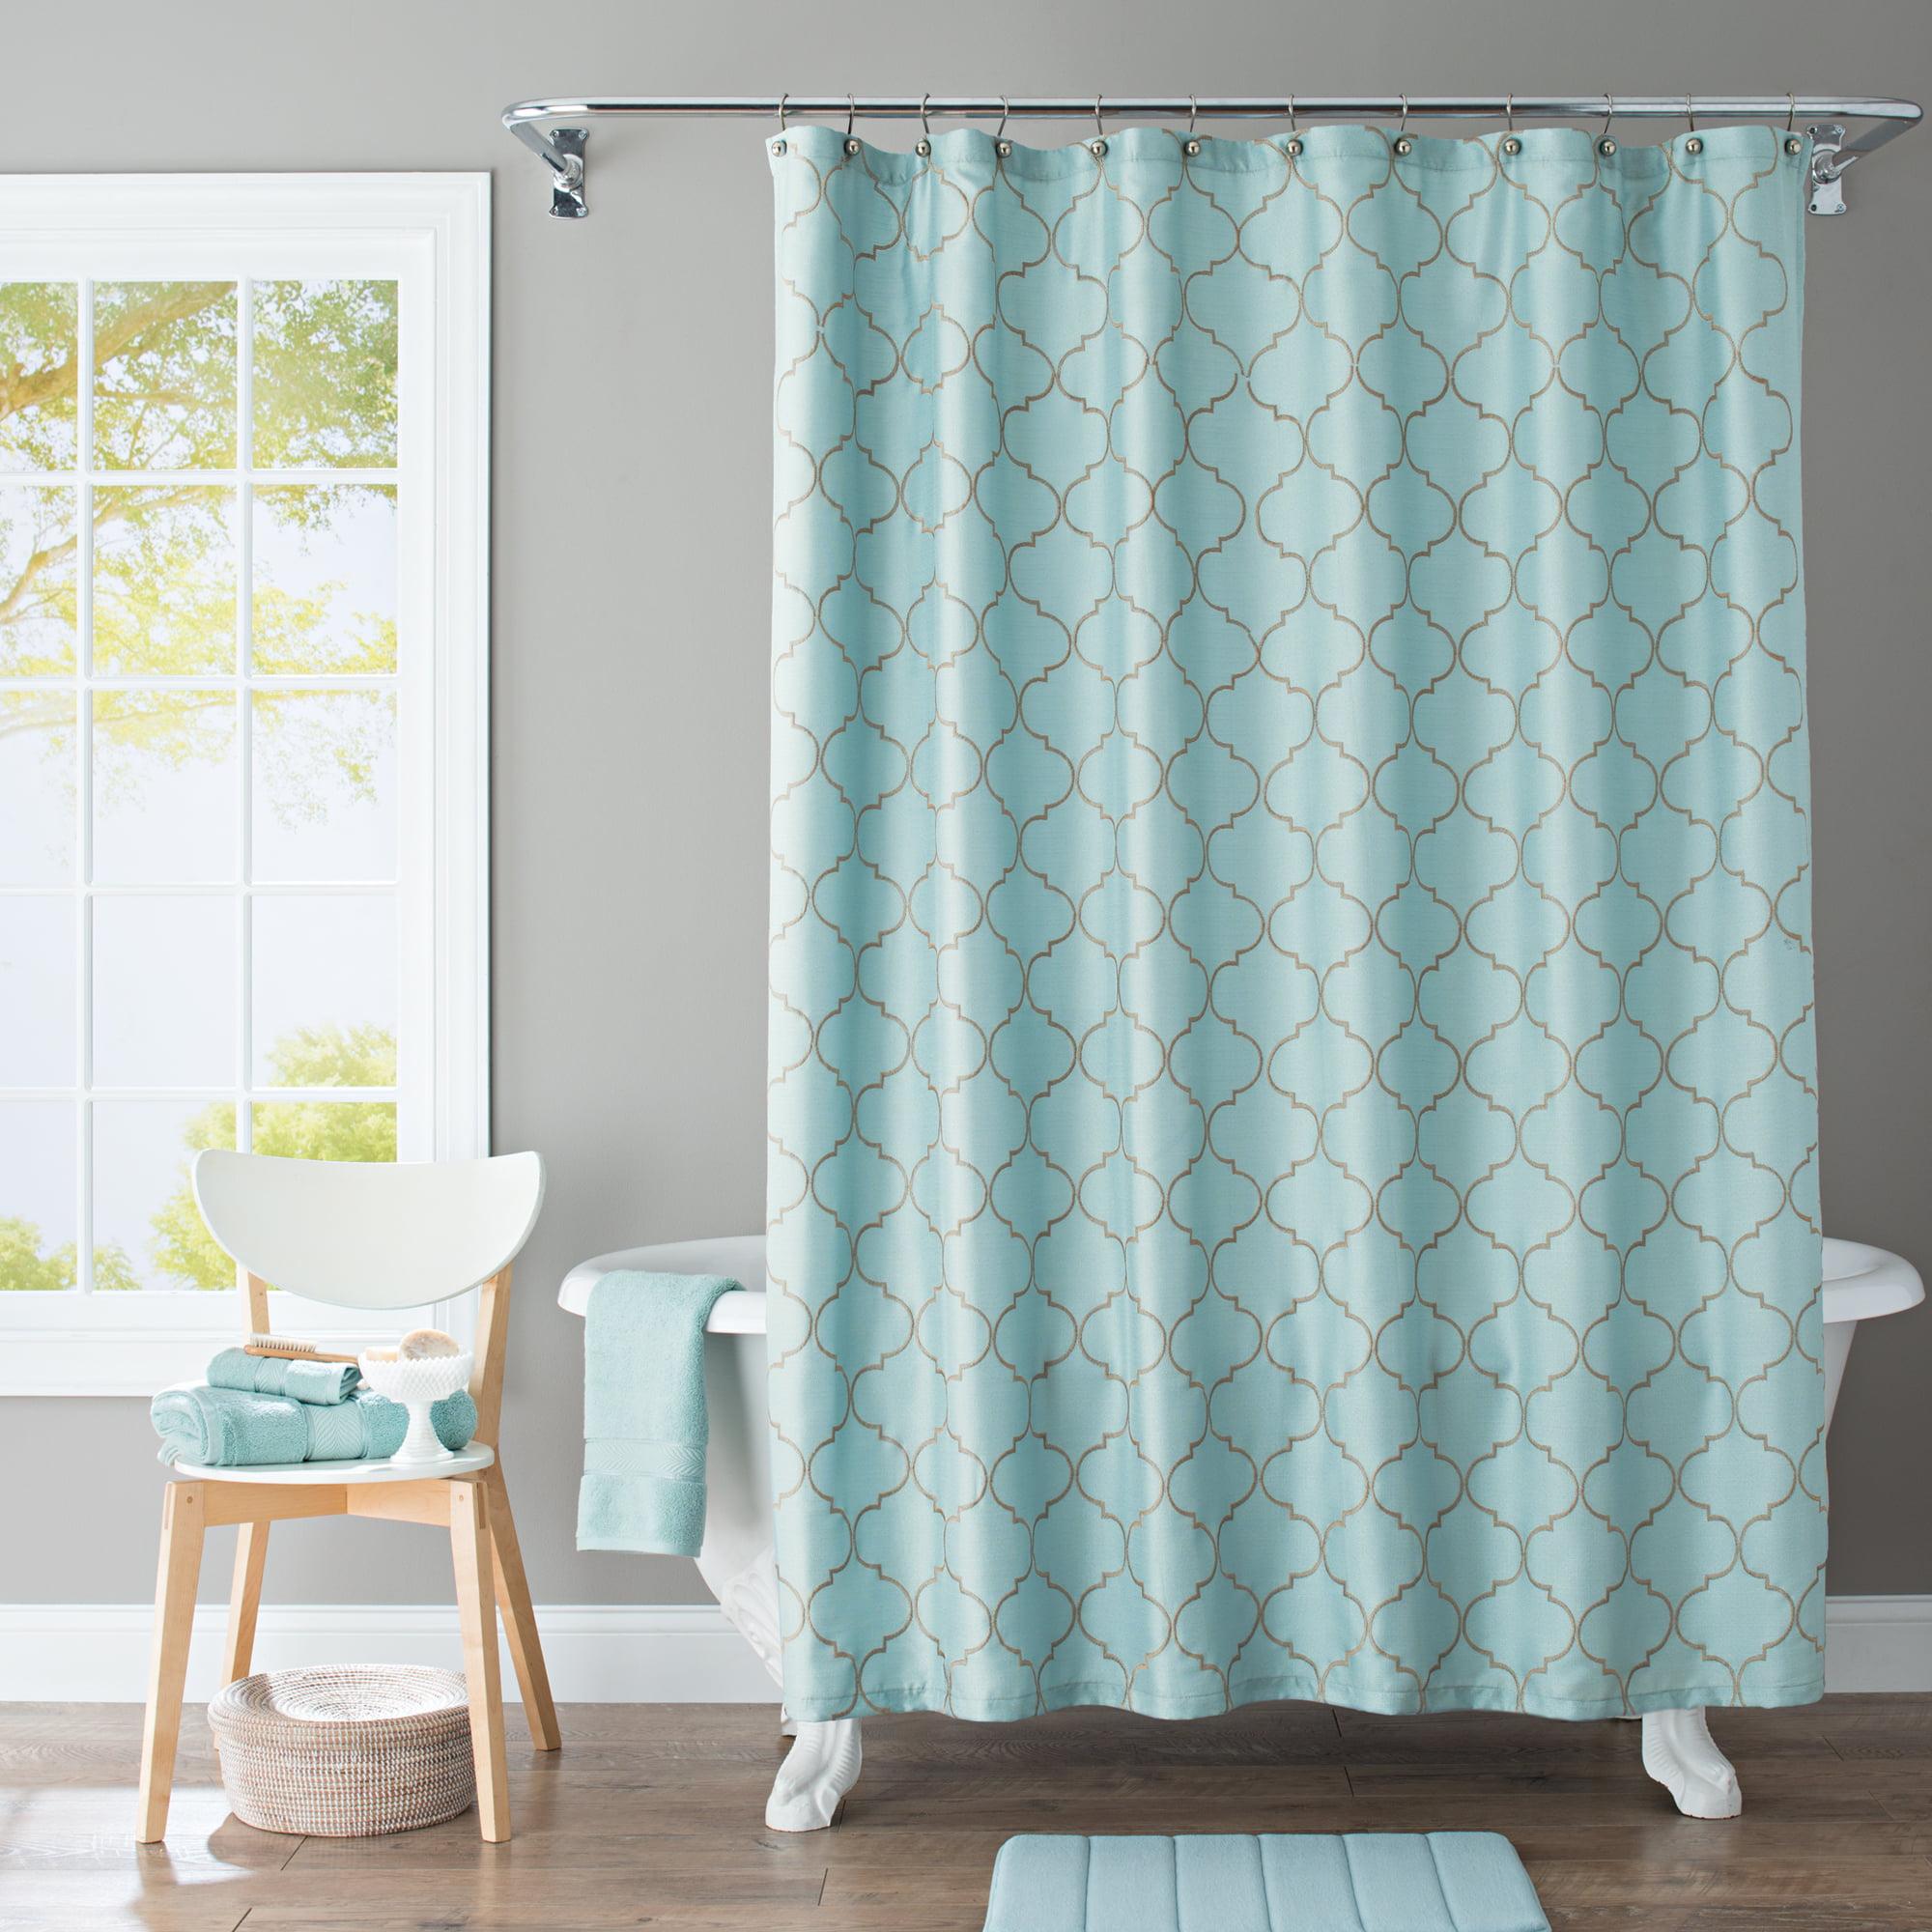 Better Homes Gardens Scalloped Trellis Embroidered Polyester Shower Curtain 70x72 Walmart Com Walmart Com